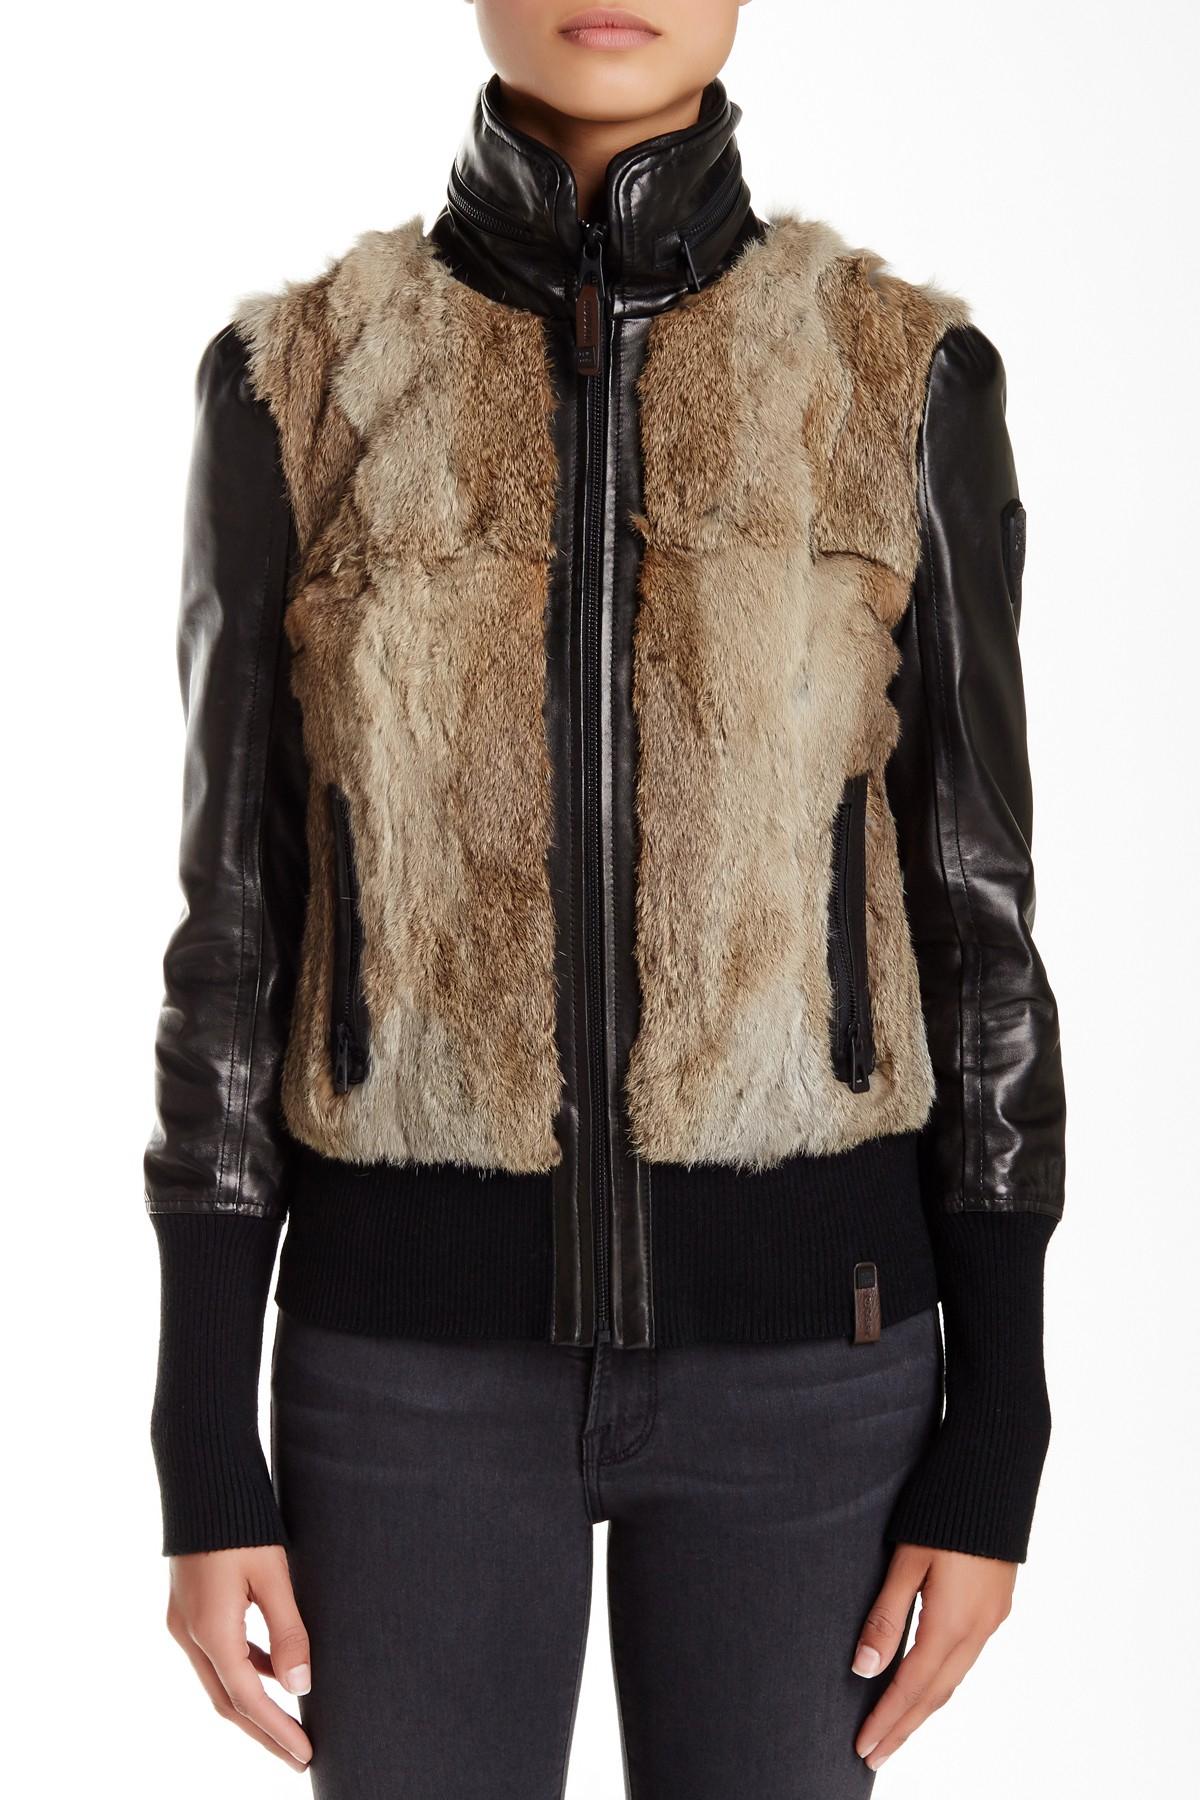 35a2558b9016d Lyst - Rudsak Genuine Rabbit Fur   Leather Bomber in Black